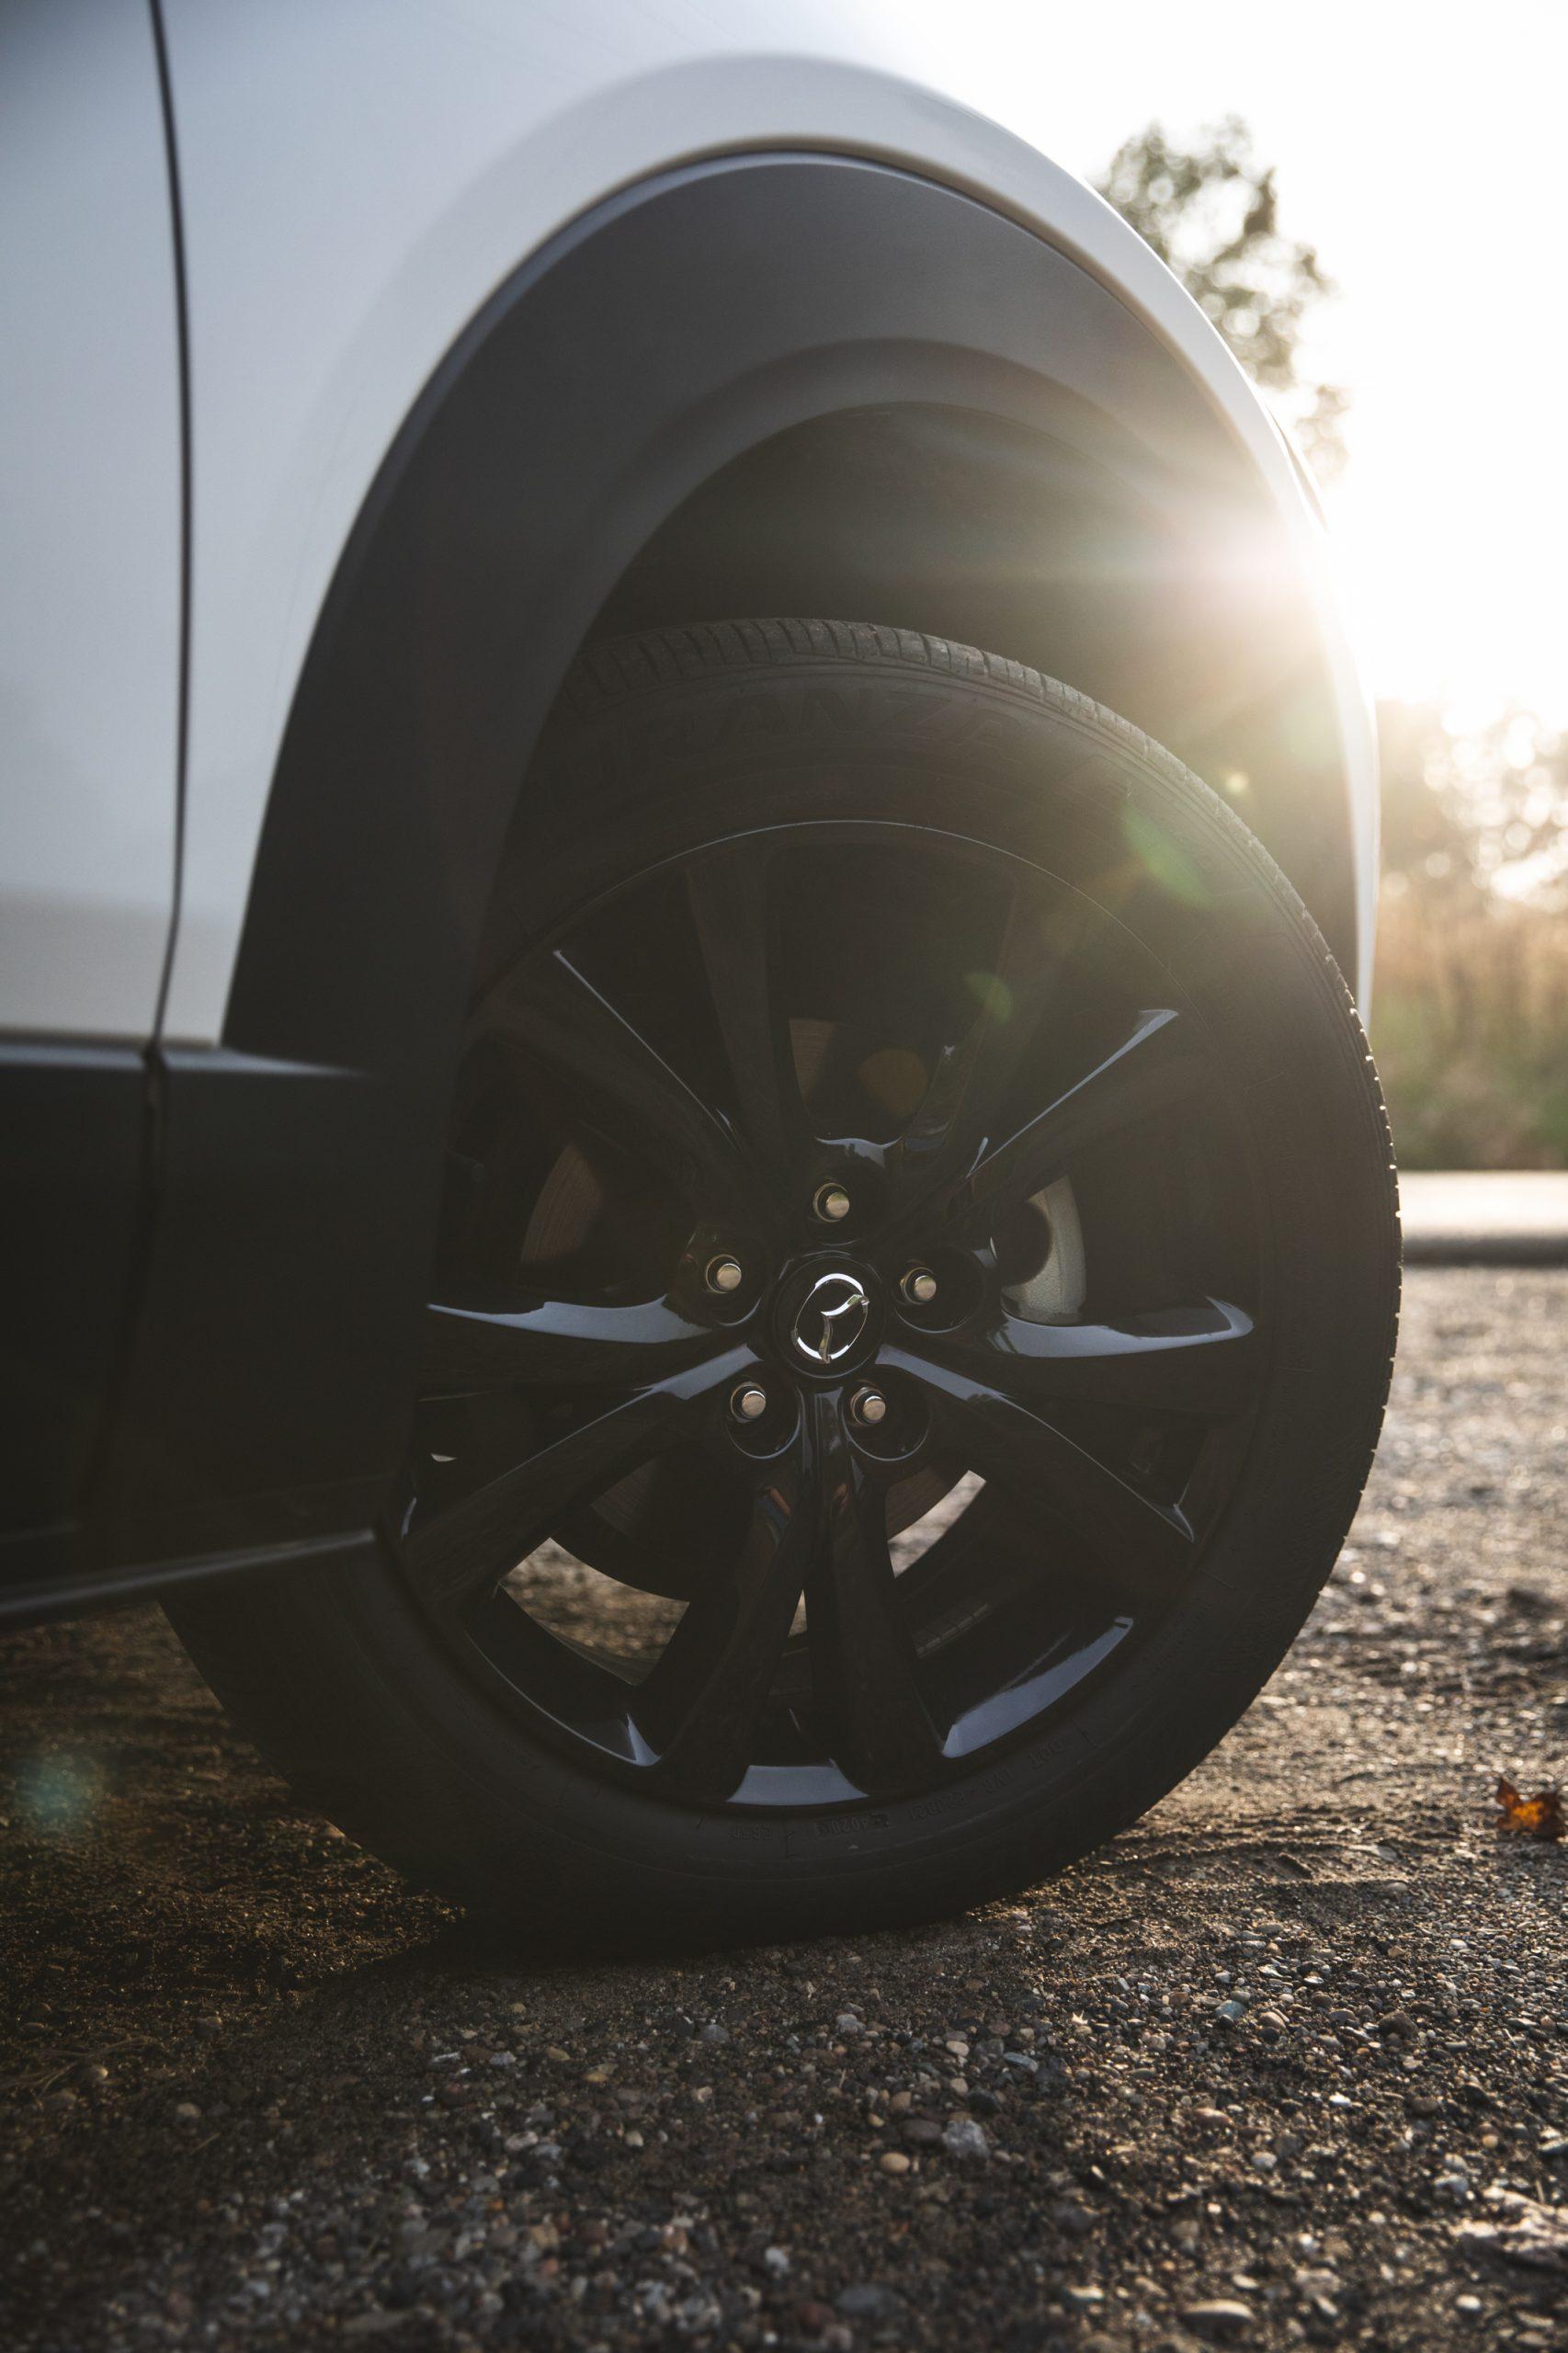 Mazda CX30 front wheel tire vertical